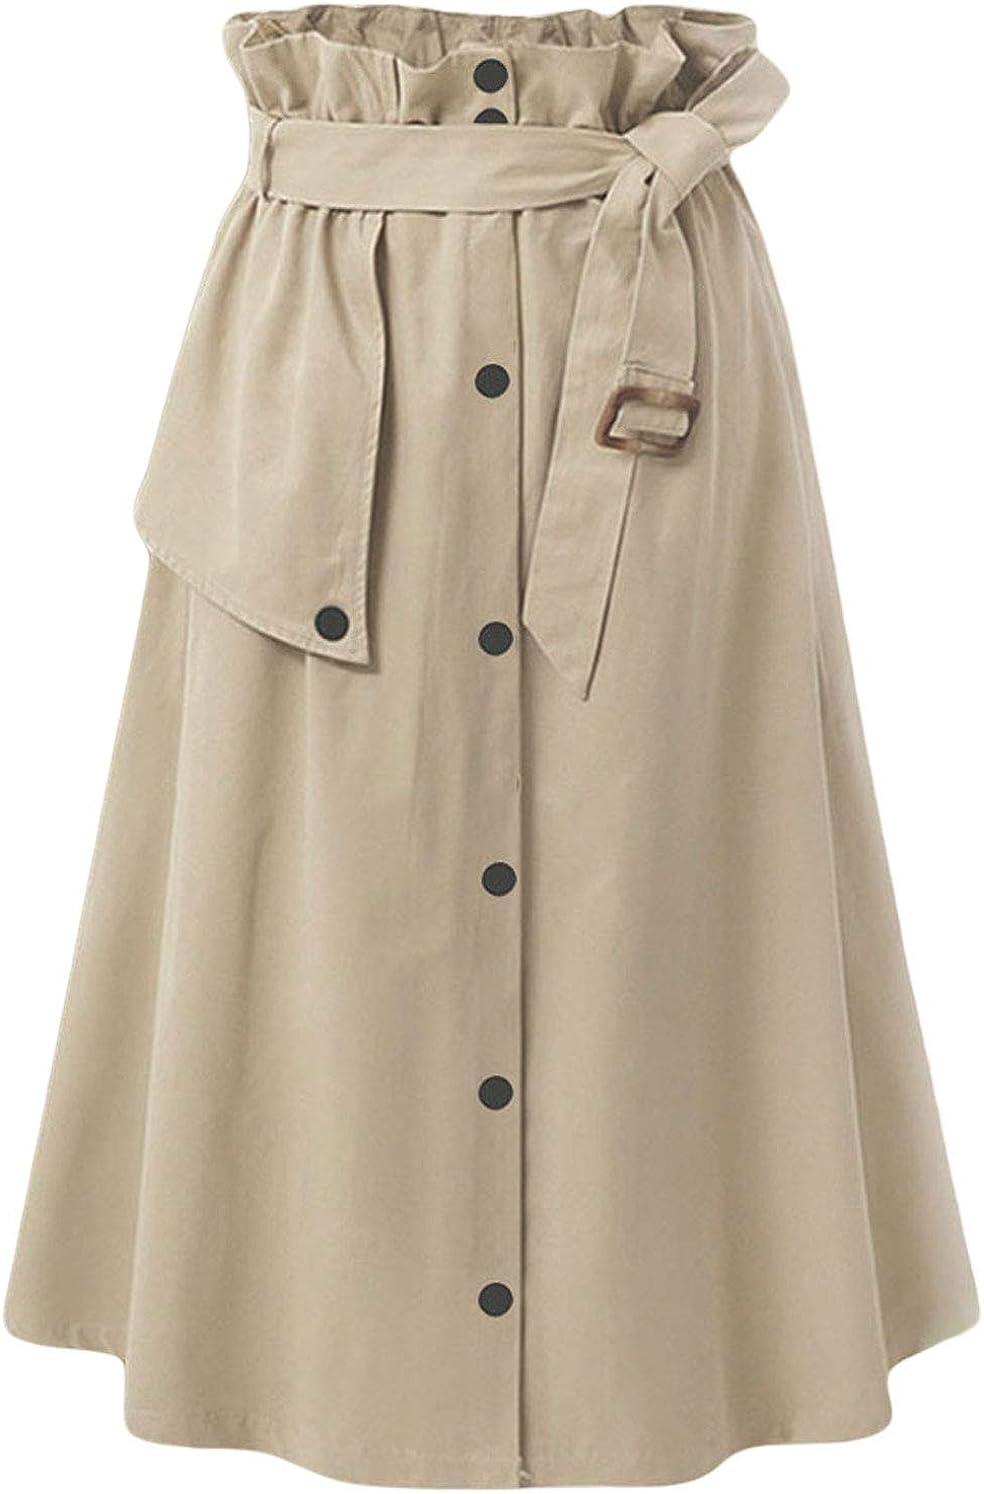 CHARTOU Women's Elegant Paper Bag High Waist Self-tie Flared Midi A-line Swing Skirt